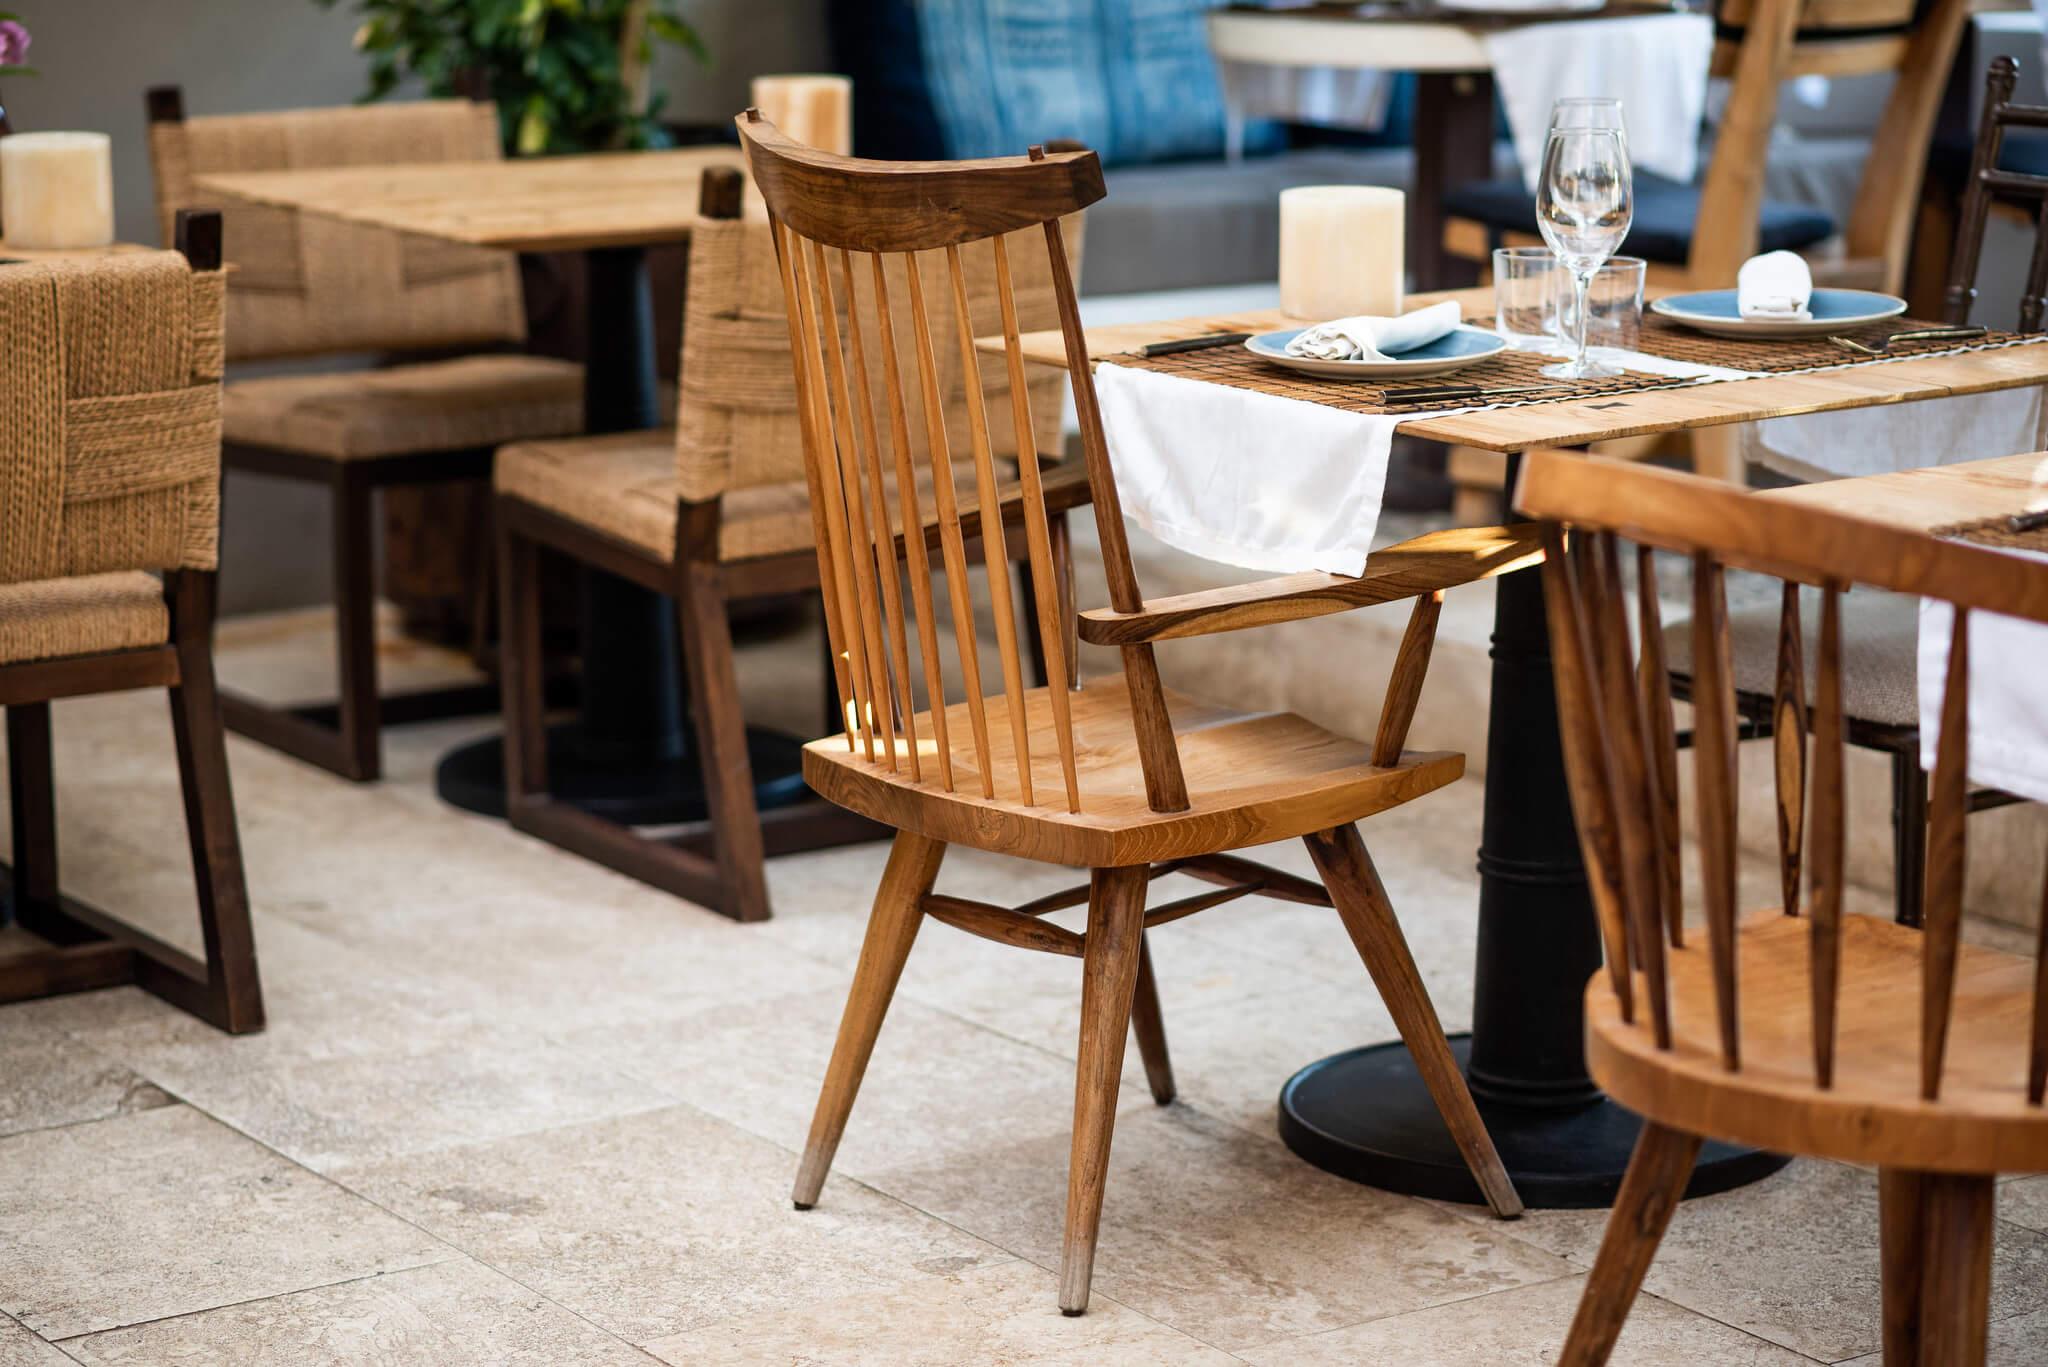 https://www.white-ibiza.com/wp-content/uploads/2020/03/ibiza-restaurants-the-giri-cafe-2020-03.jpg